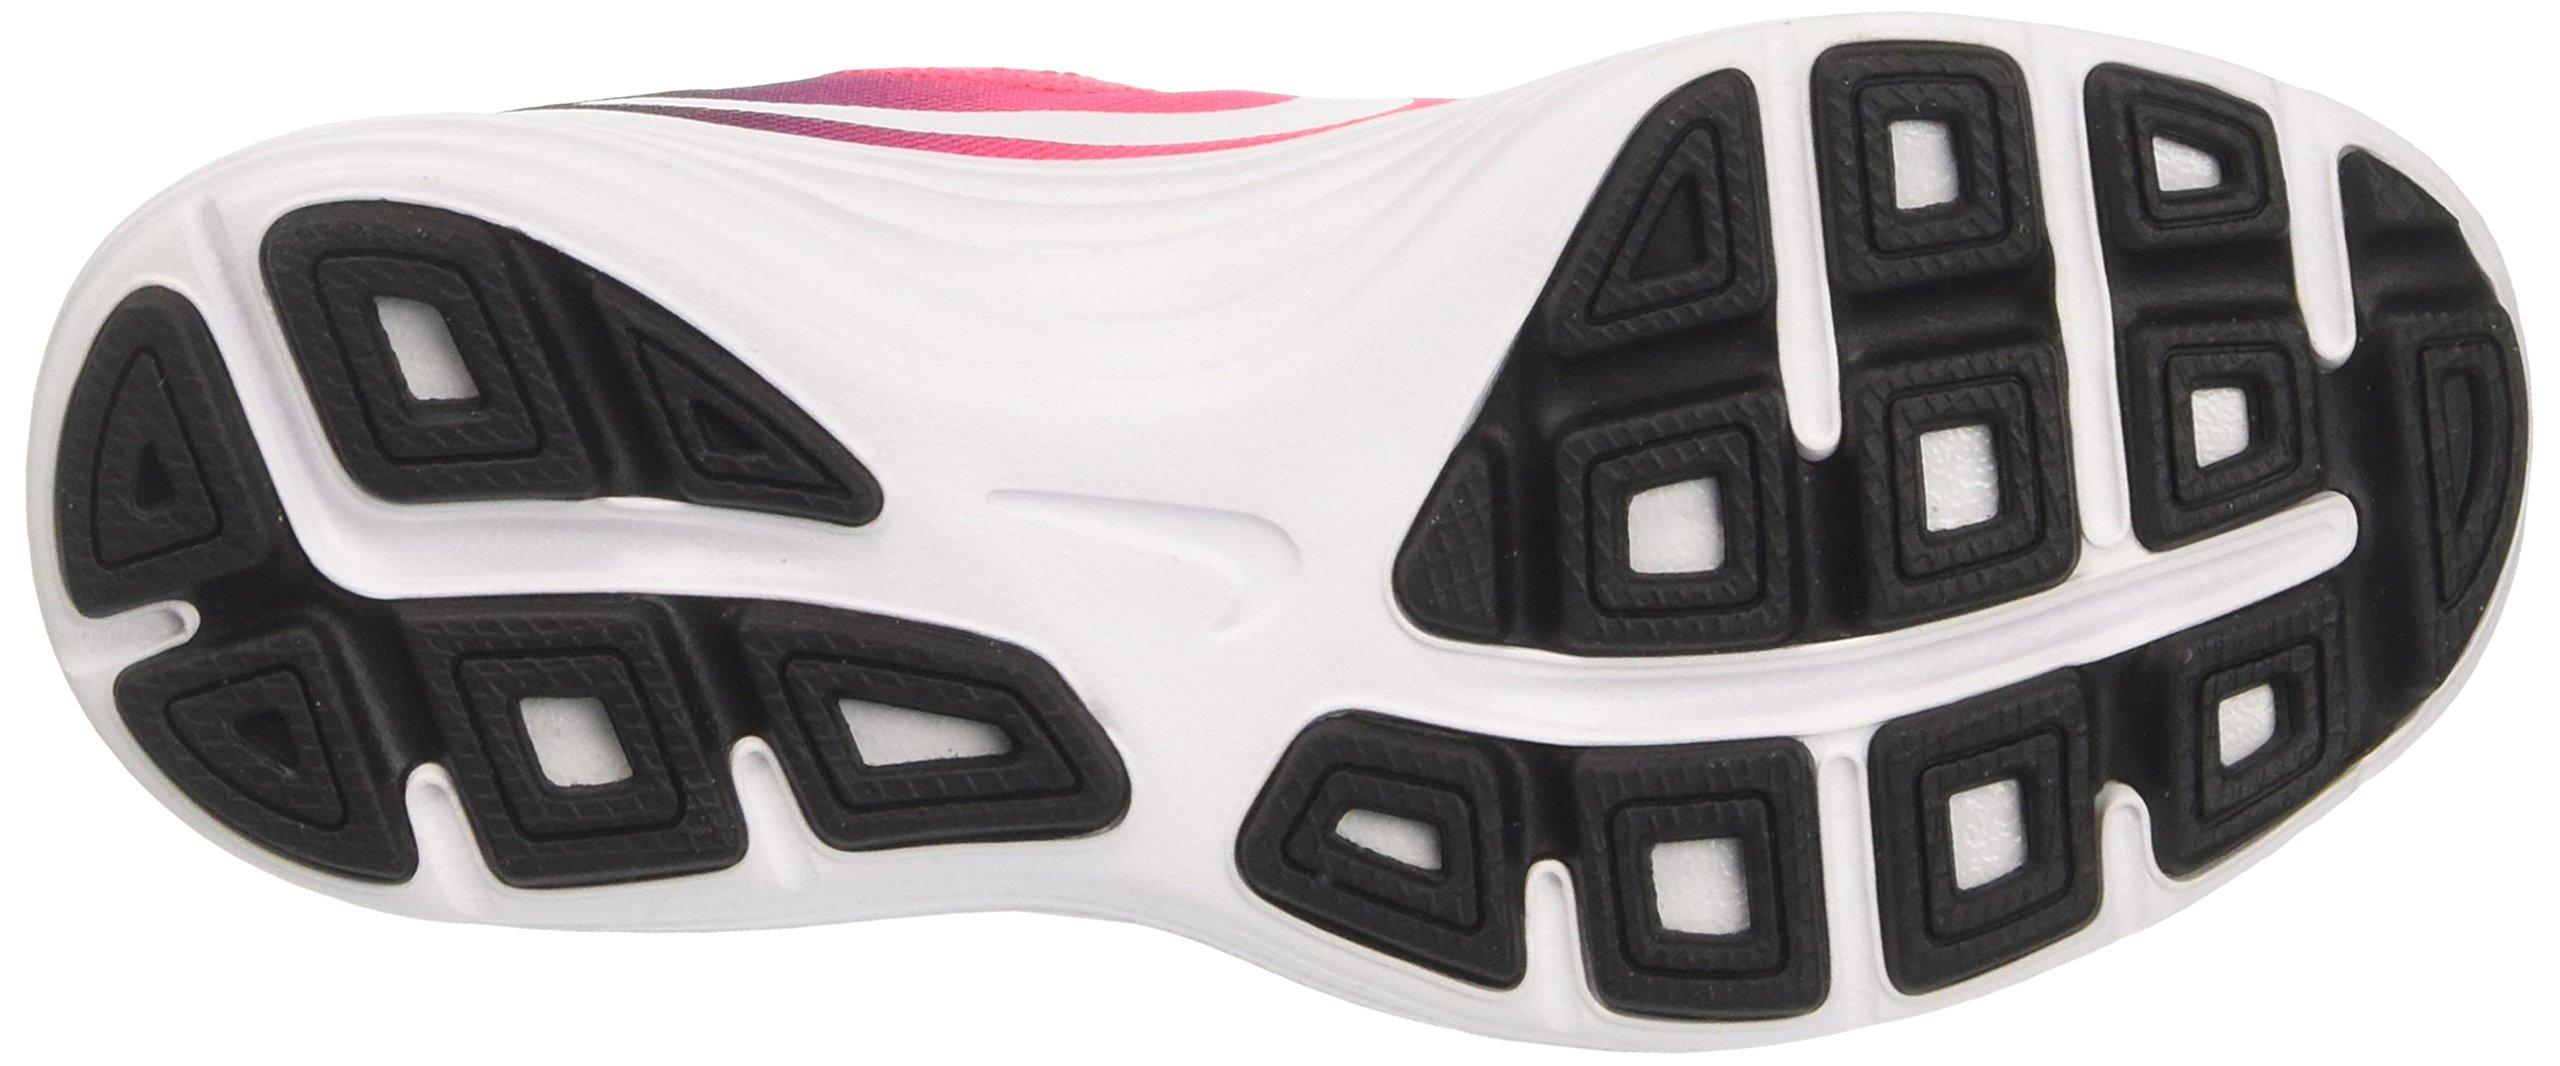 NIKE Kids' Revolution 3 (Psv) Running-Shoes, Black/White/Racer Pink/Black, 1.5 M US Little Kid by Nike (Image #3)